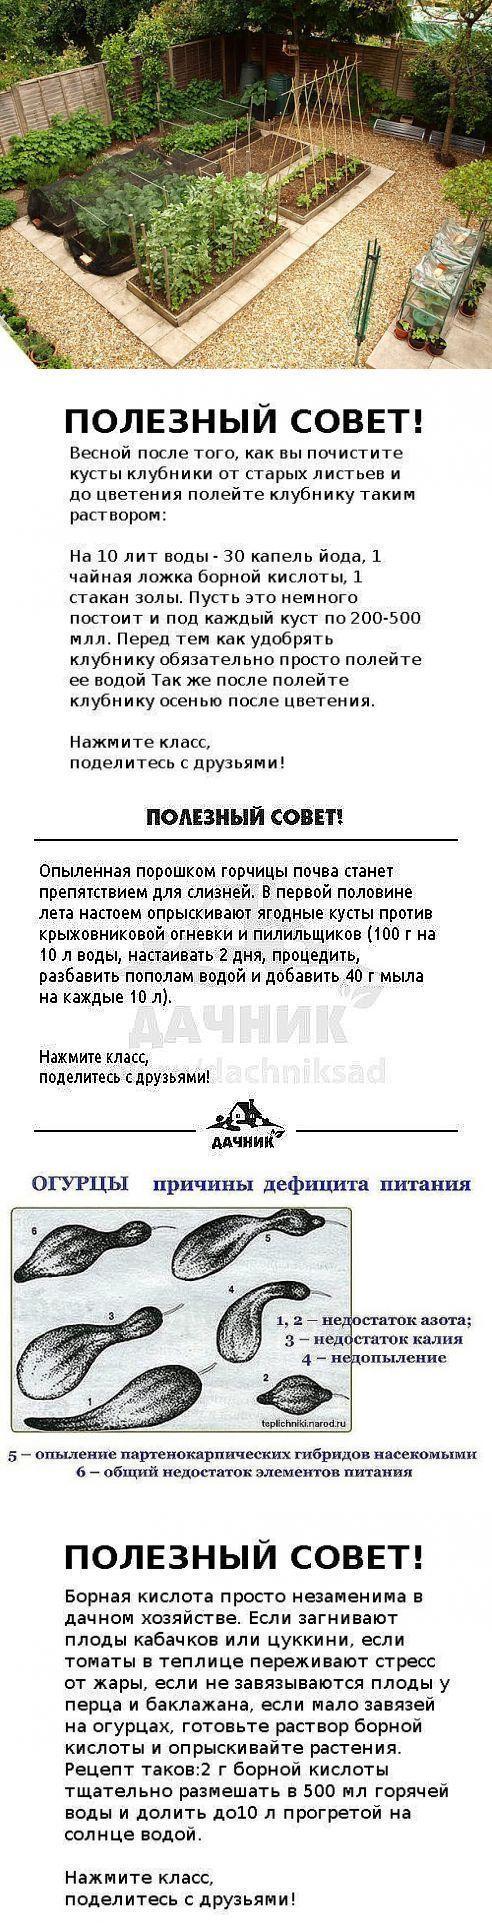 ru.pinterest.com